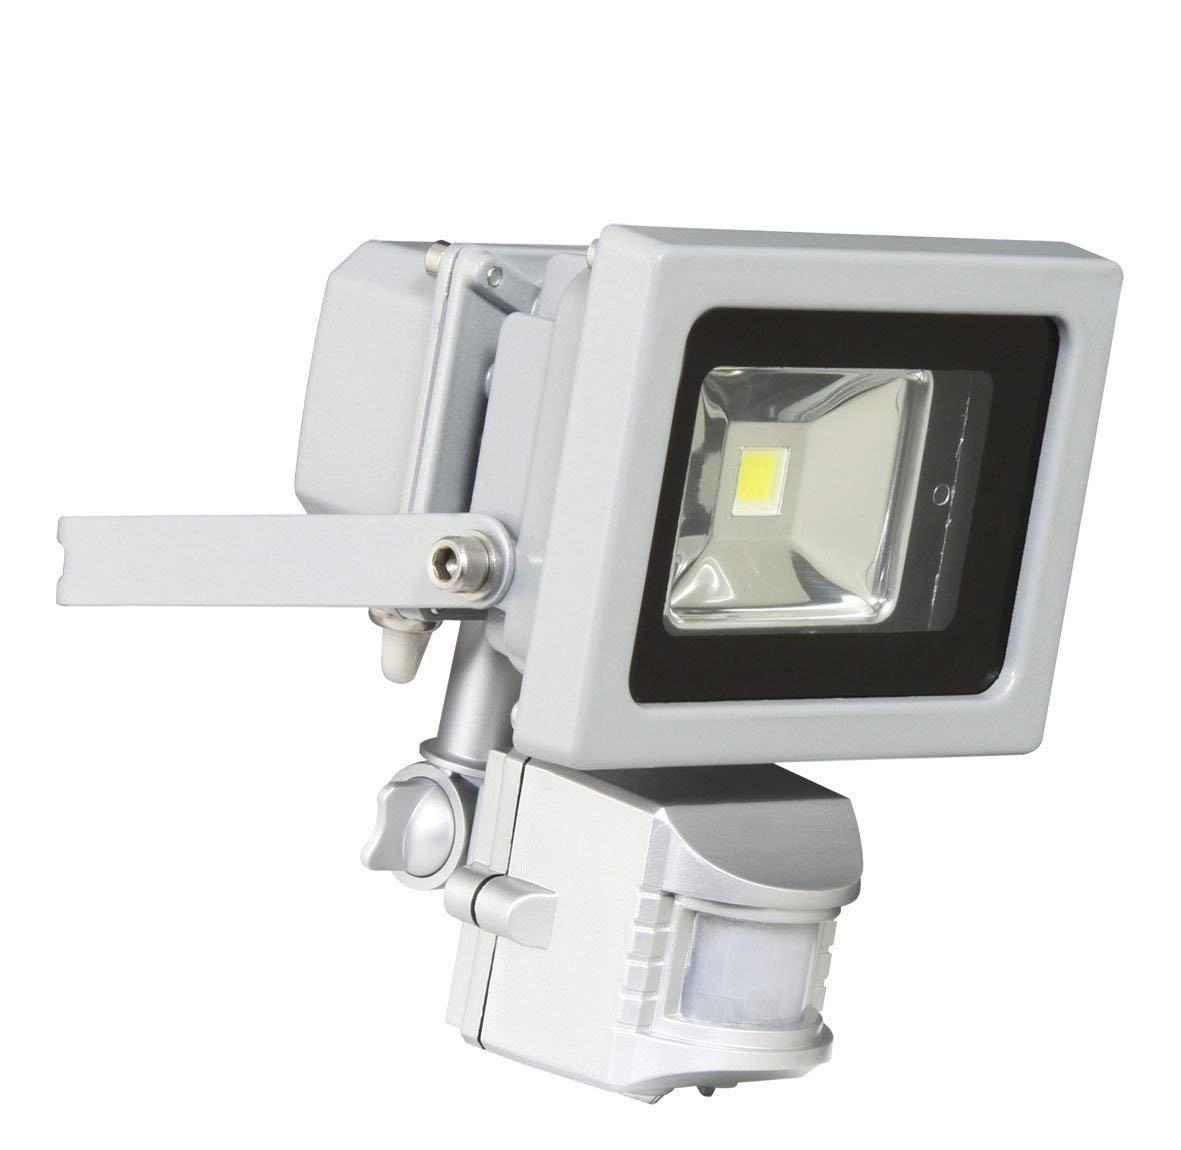 LED Security Floodlight 10W With PIR